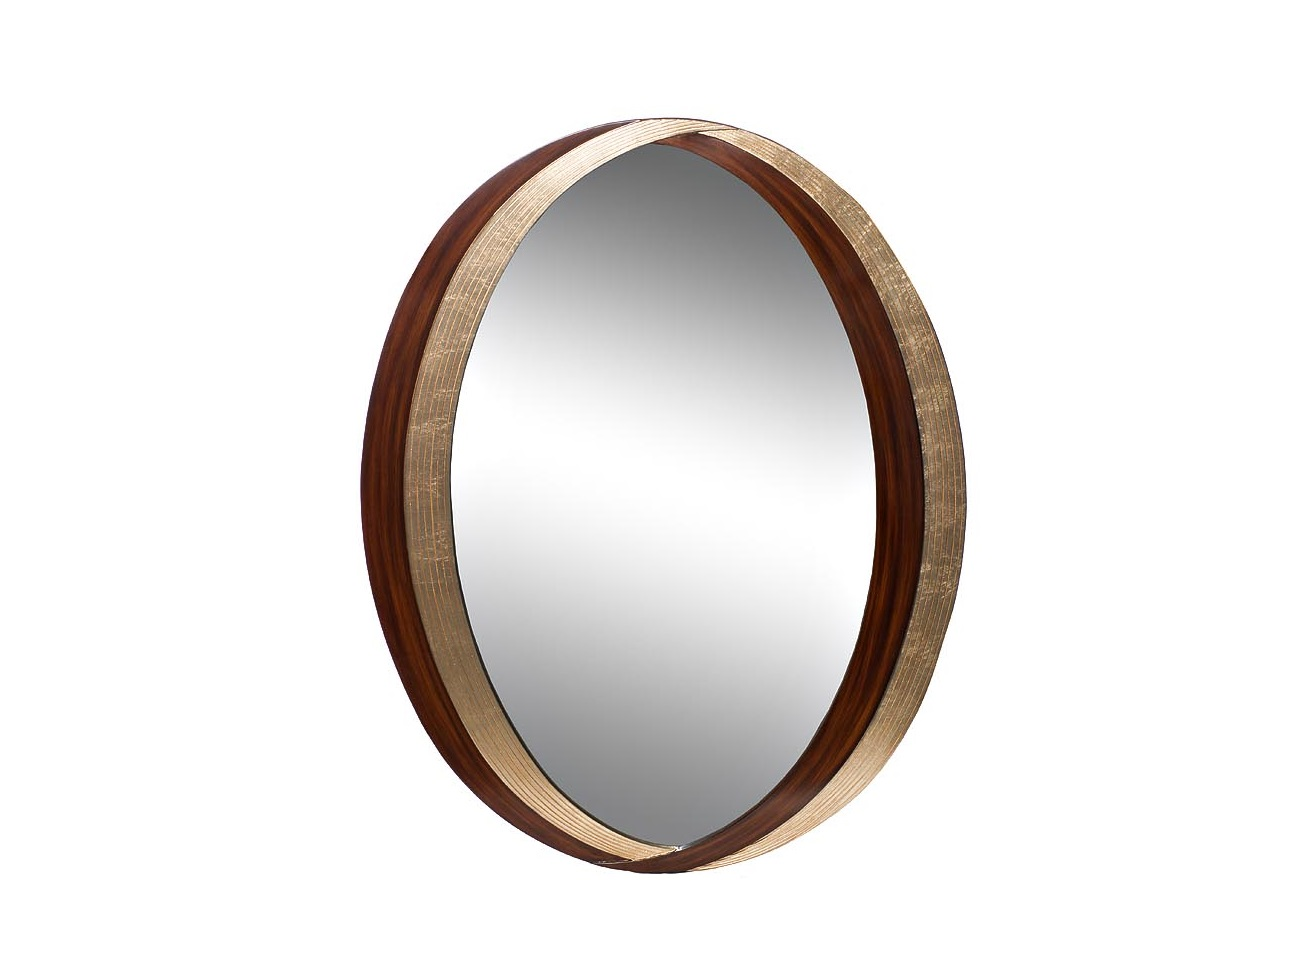 Работающее Зеркало РусТелетот